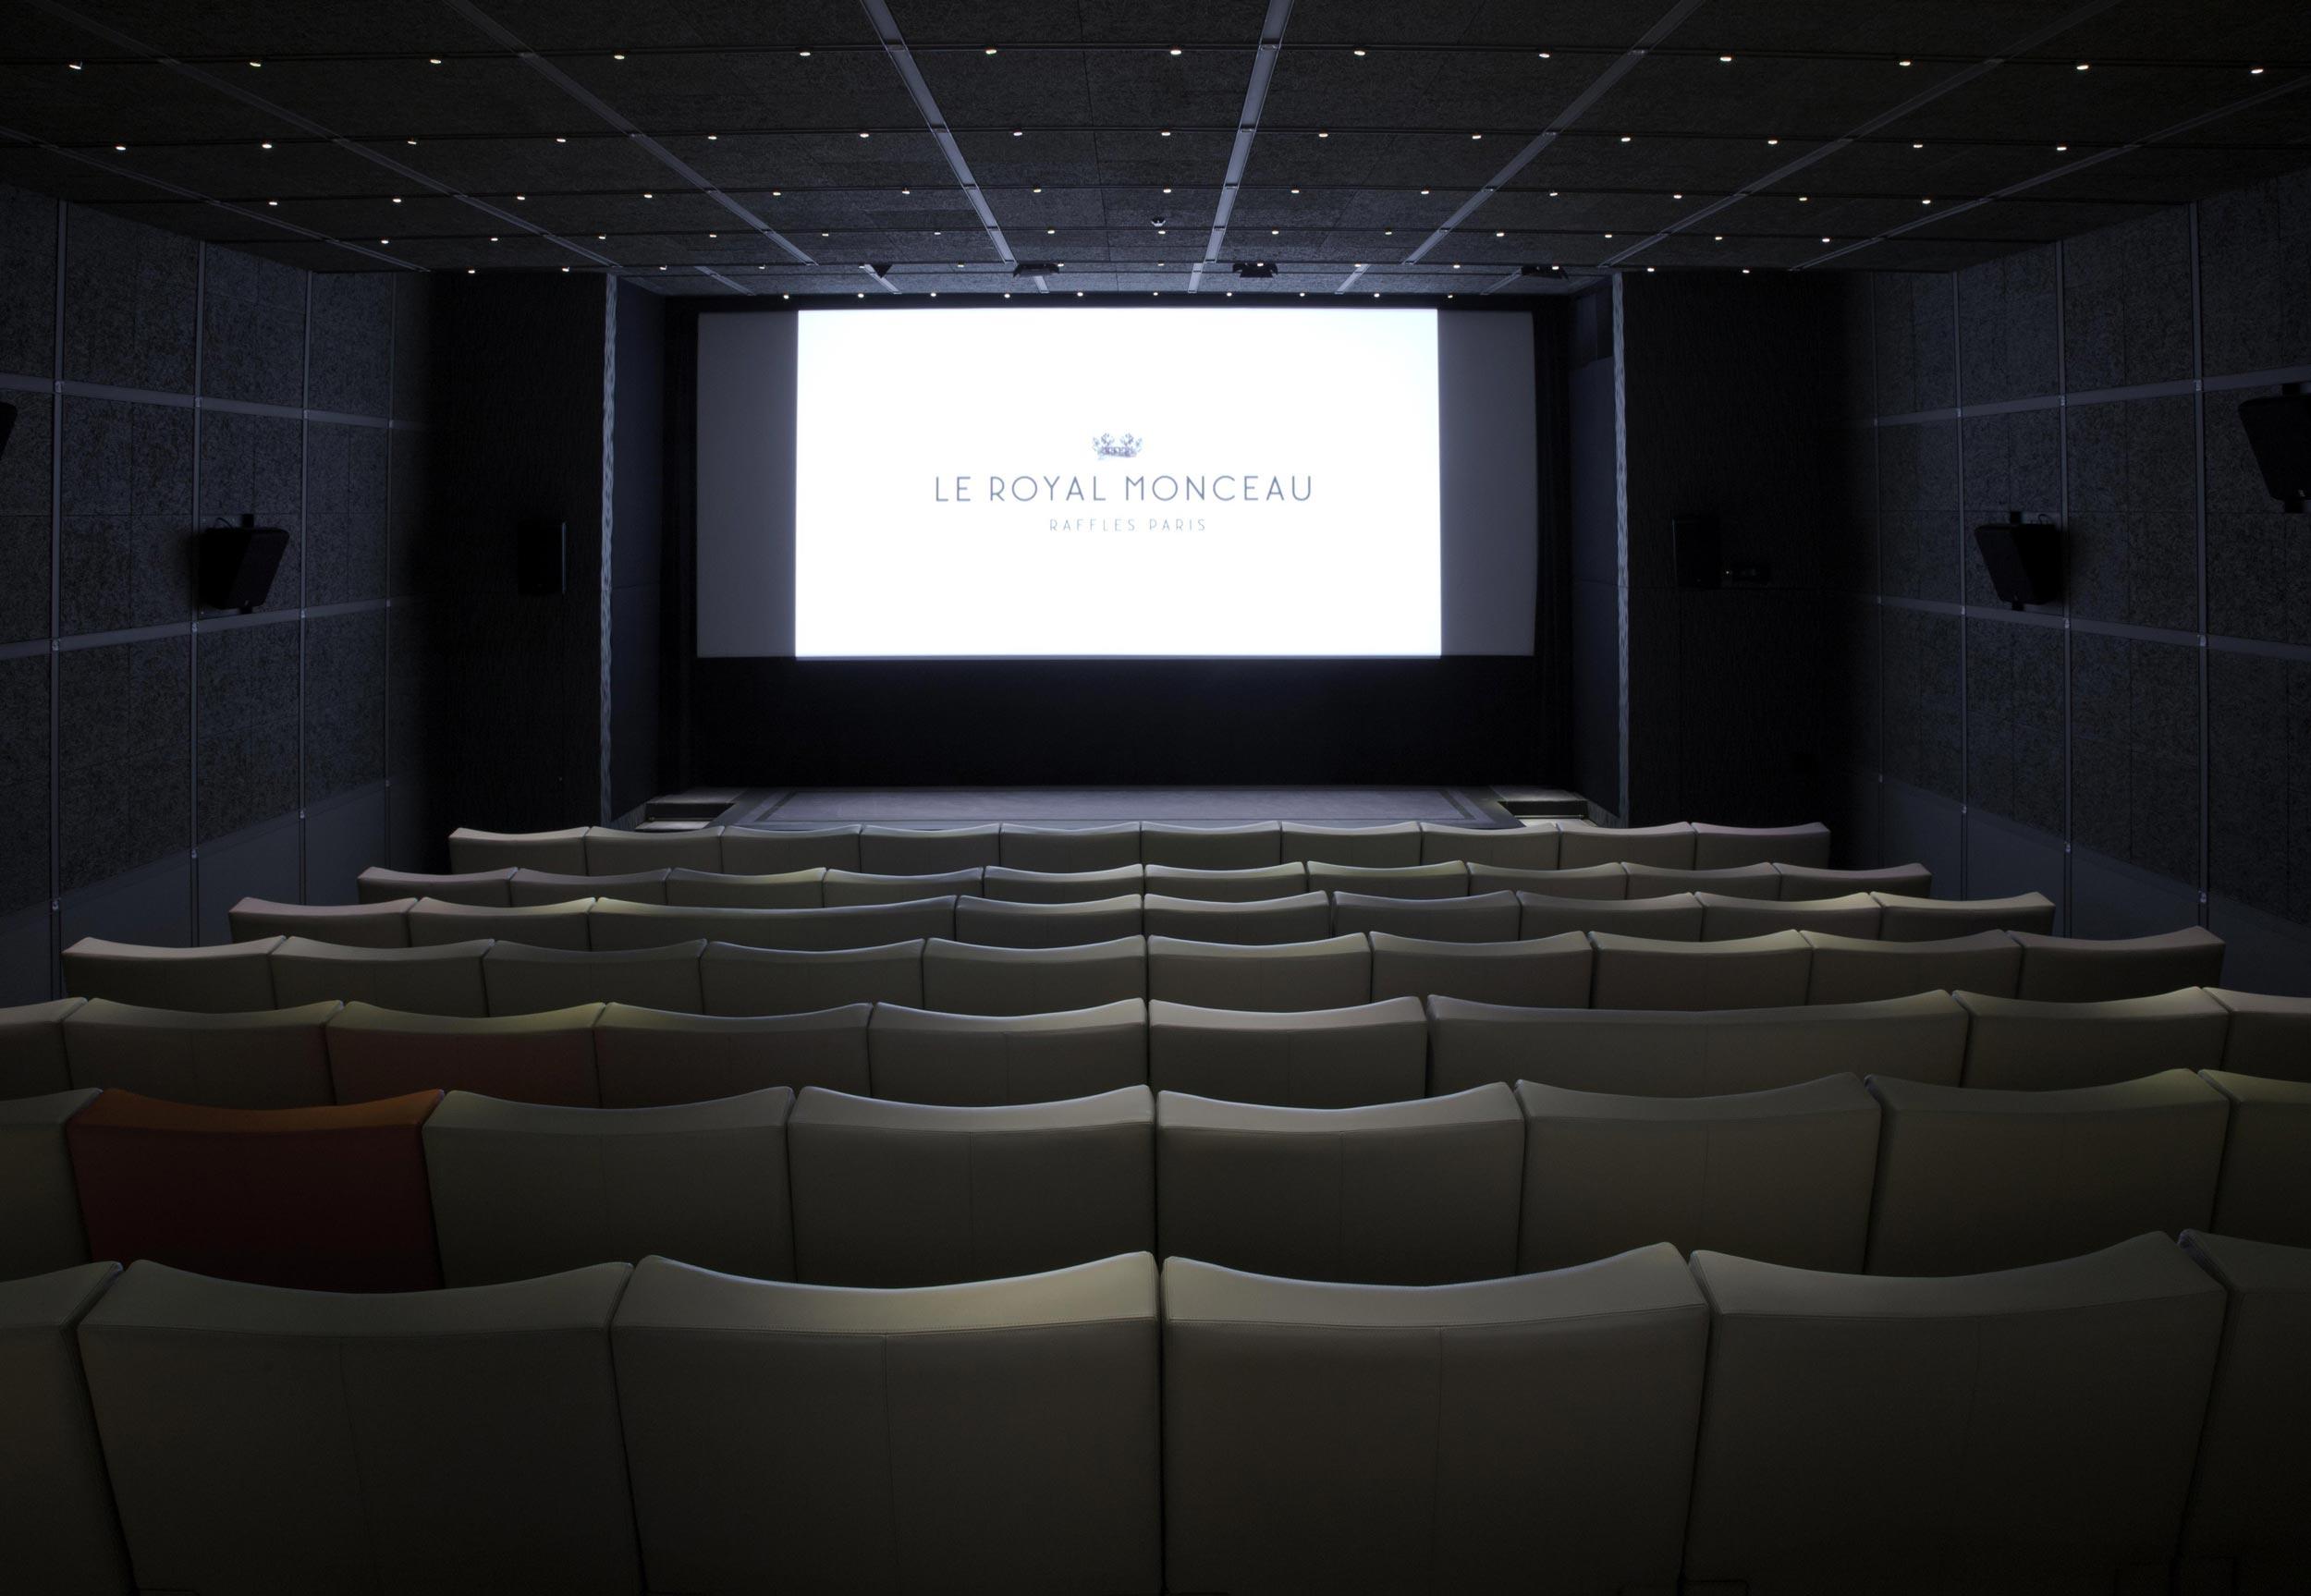 Private events  Katara Cinema  Le Royal Monceau Hotel